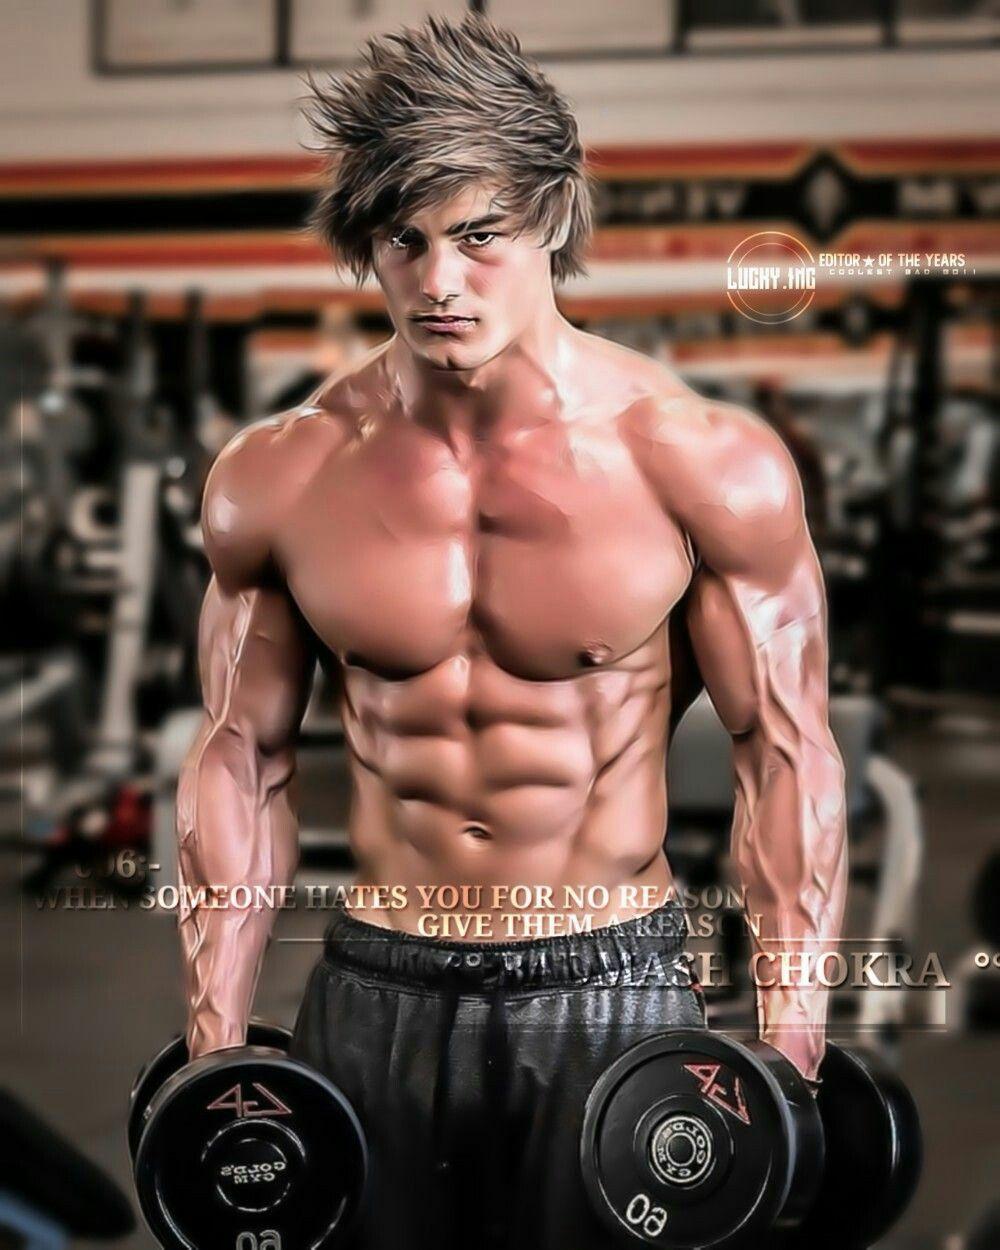 Hot Look Boy Wallpaper Or Hot Fitness Model Jeff Seid Hd Wallpaper Gym Boy Gym Life Bodybuilding Motivation